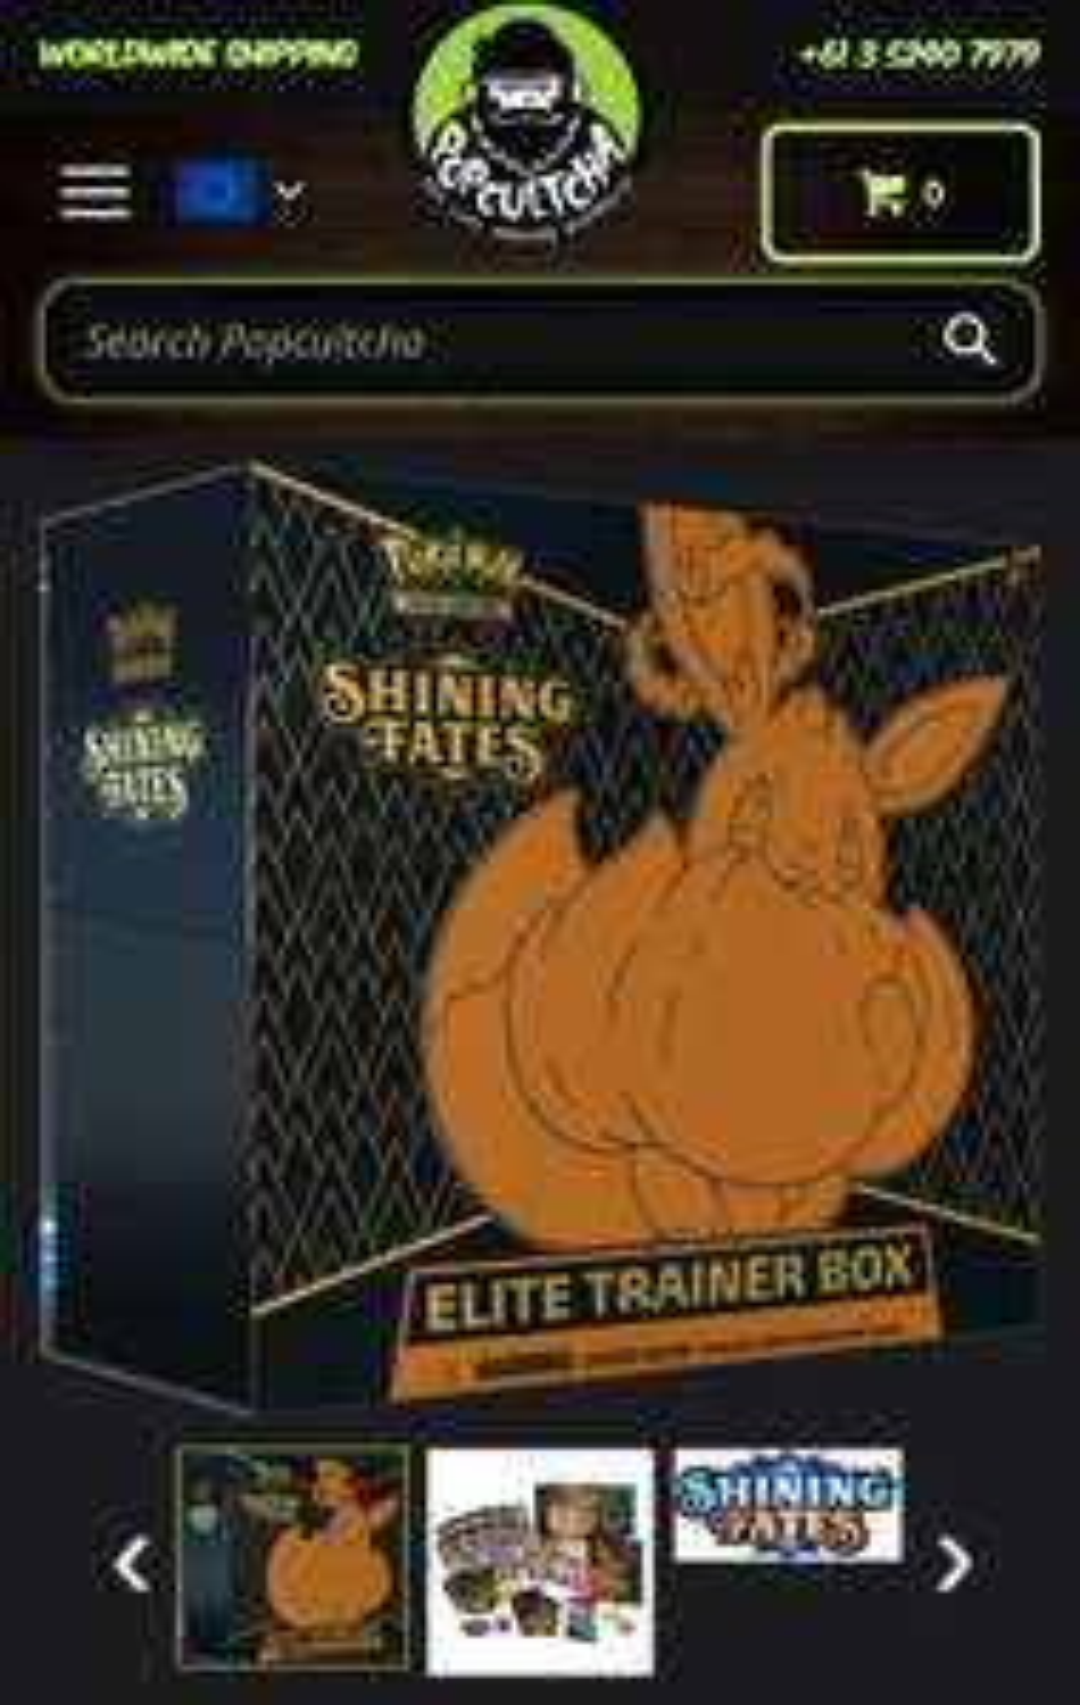 Pokemon - Shining Fates Elite Trainer Box